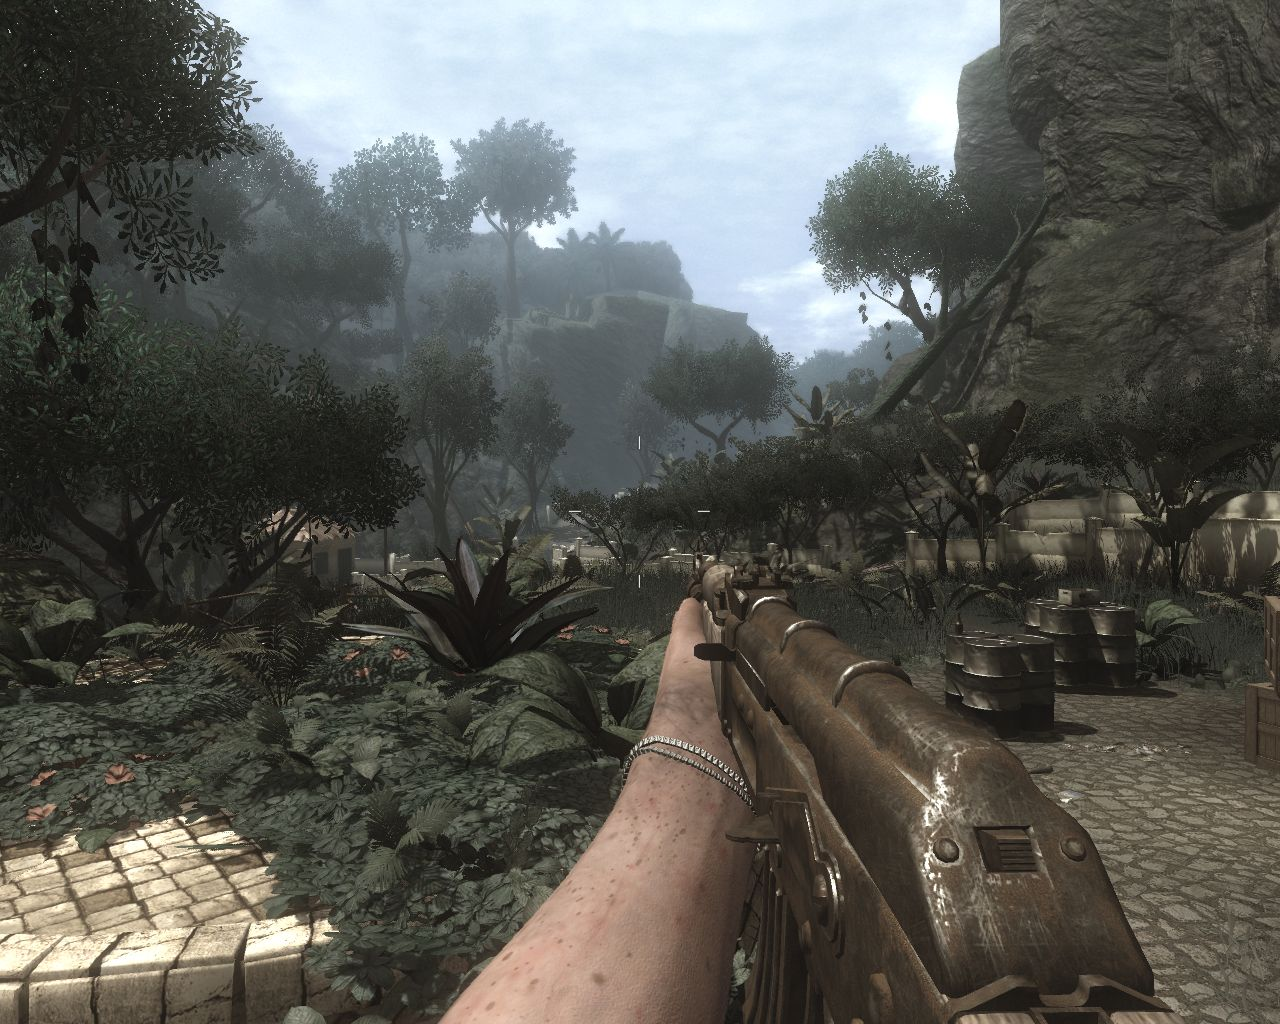 Df Far Cry 5 Vs Far Cry 2 Engine Analysis A Decade Of Tech